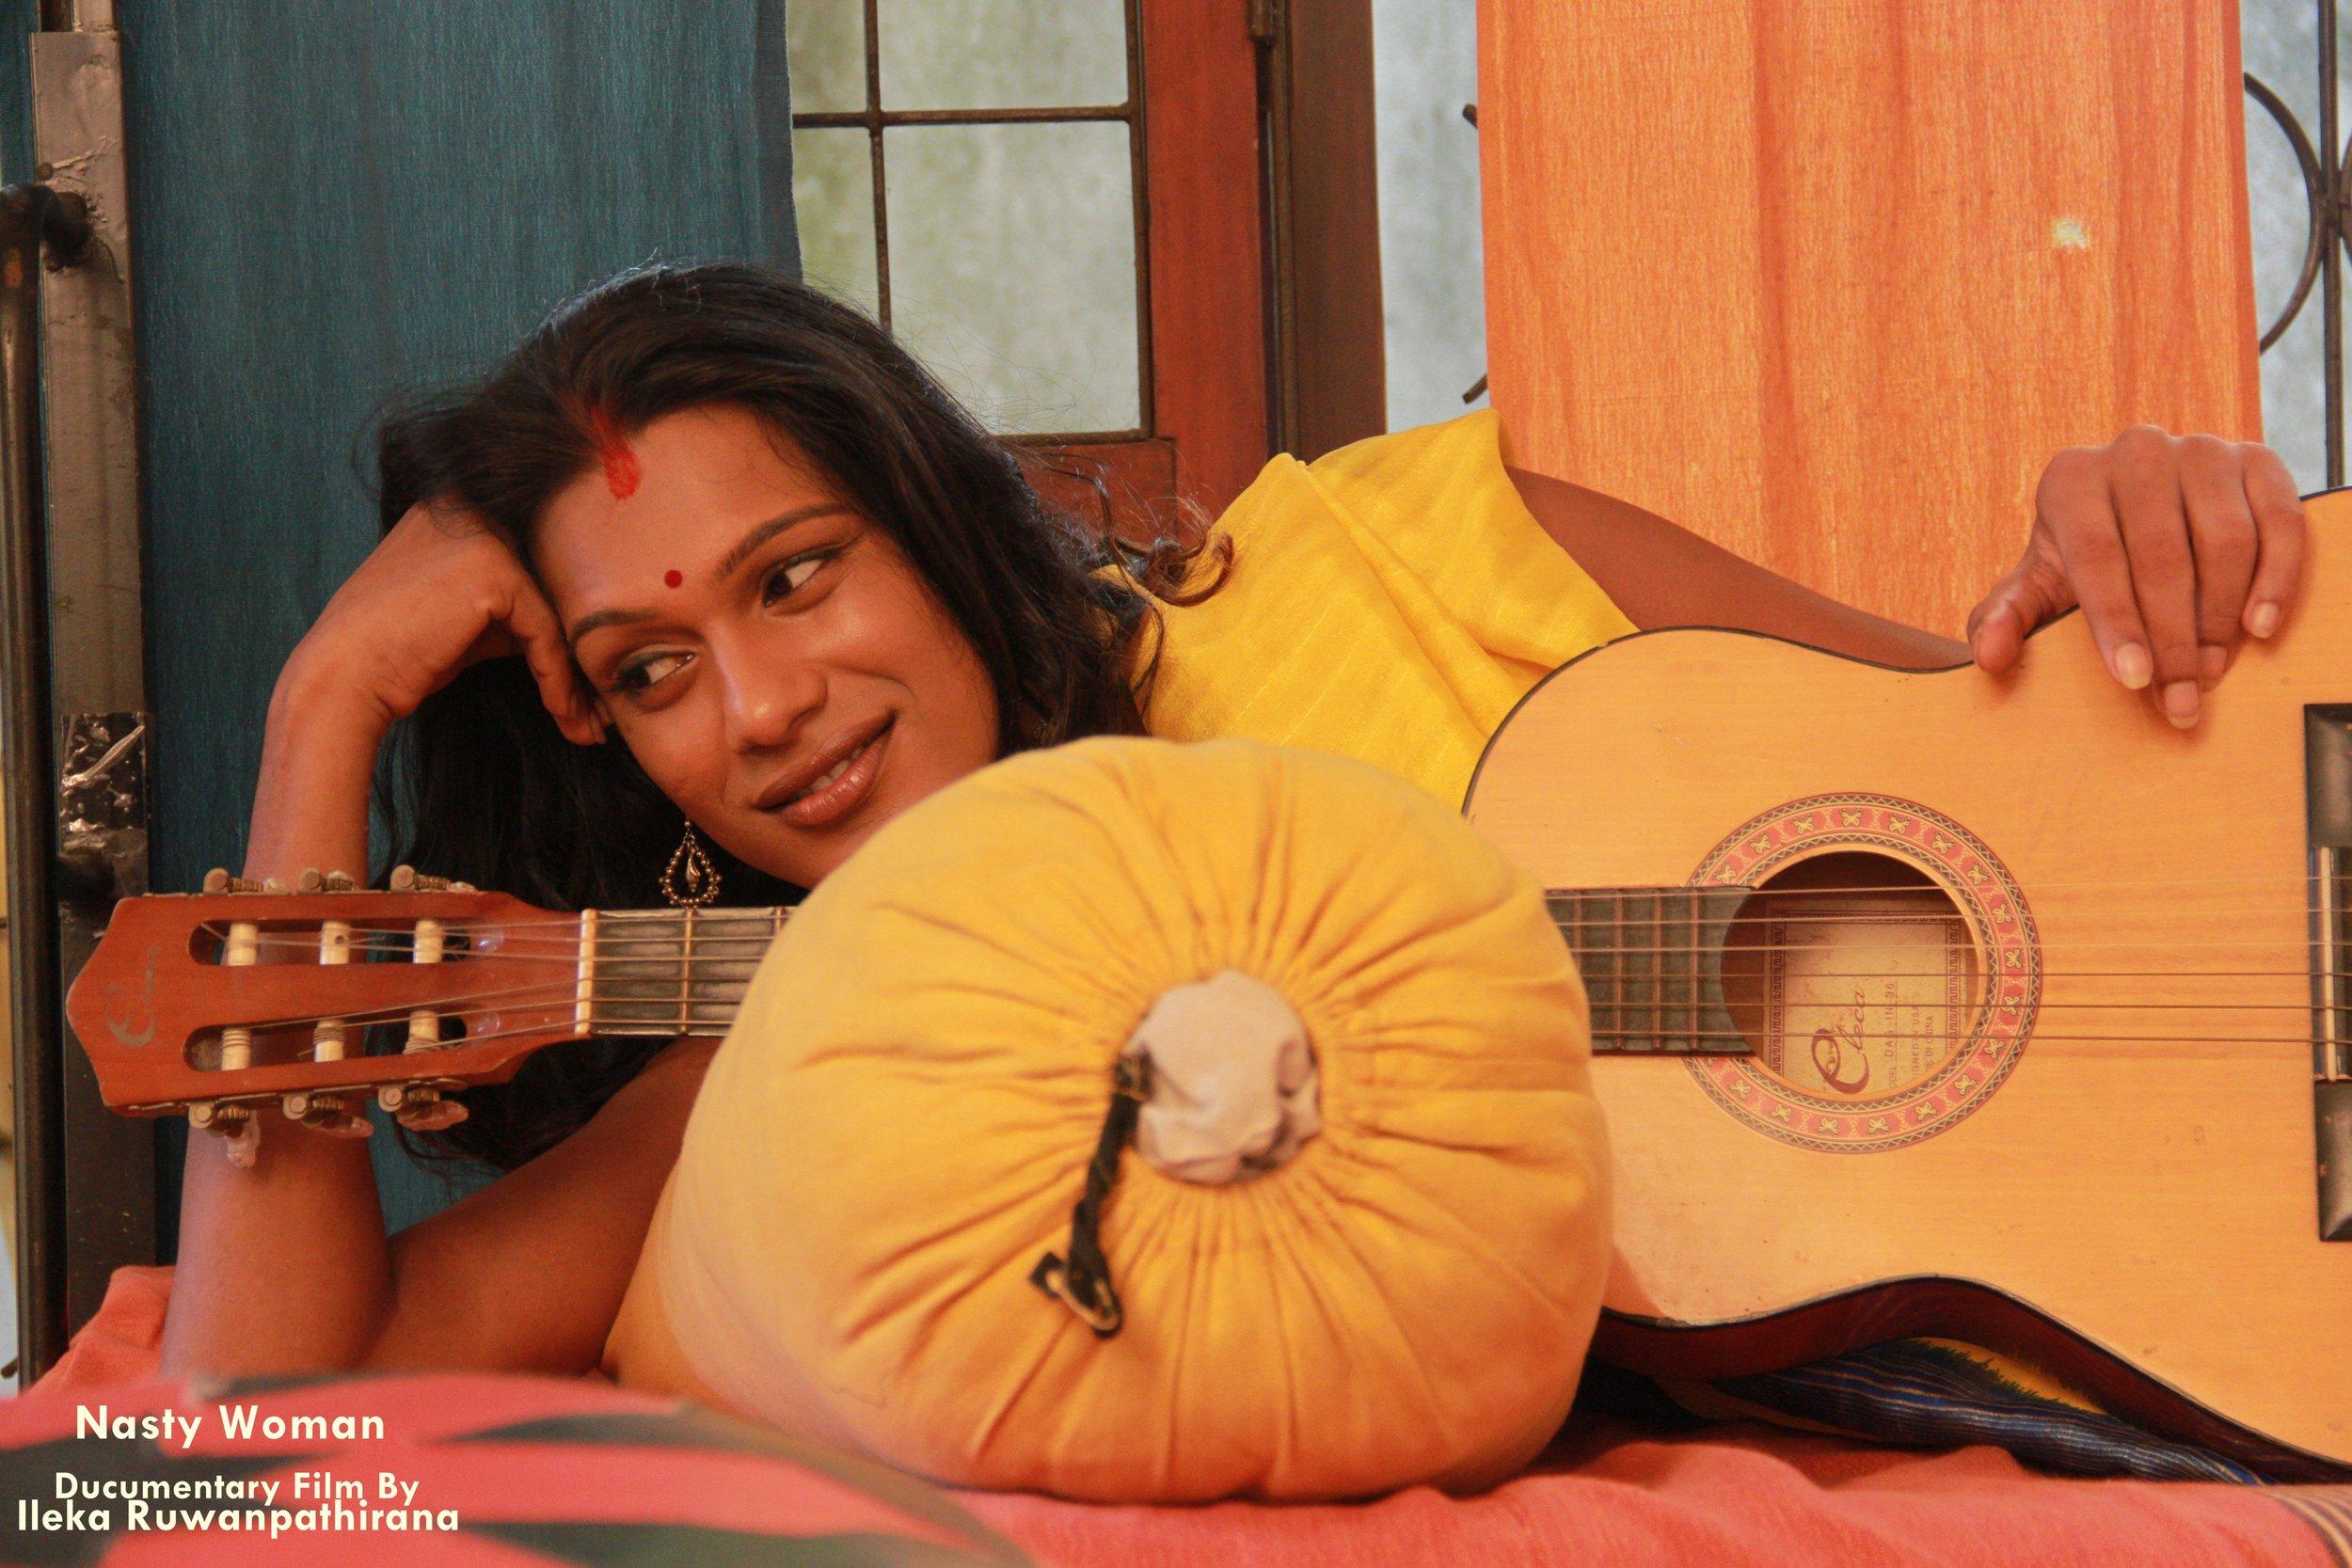 NASTY WOMAN - Documentary | Sri Lanka | English | 2018 | Ileka Ruwanpathirana | 5 min